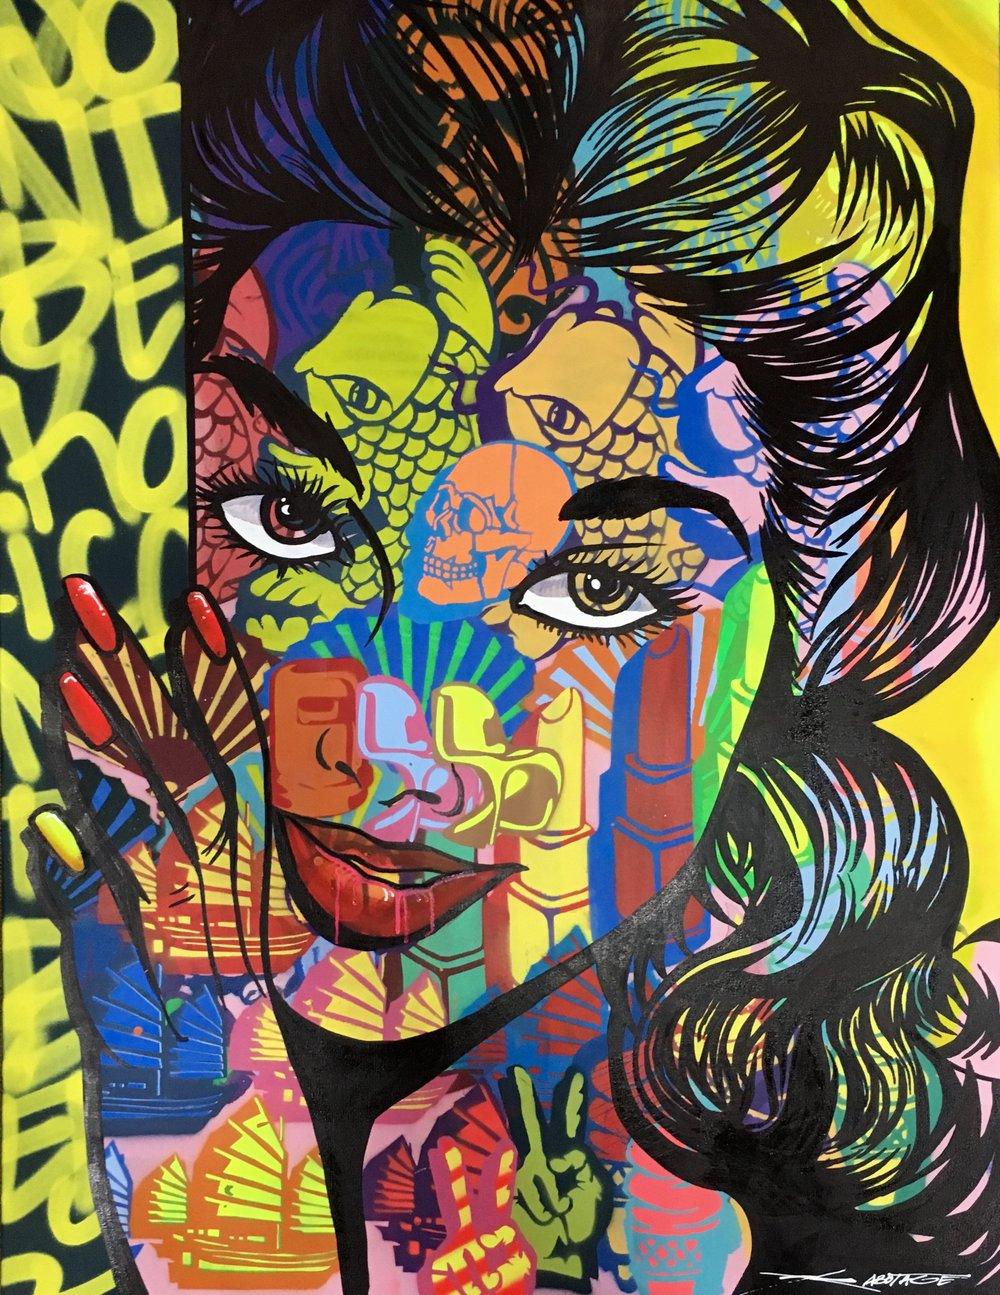 """Don't Be Koi"" Spray Paint, Stencil and Graffiti Marker 91 x 122 x 4 cm 2018"